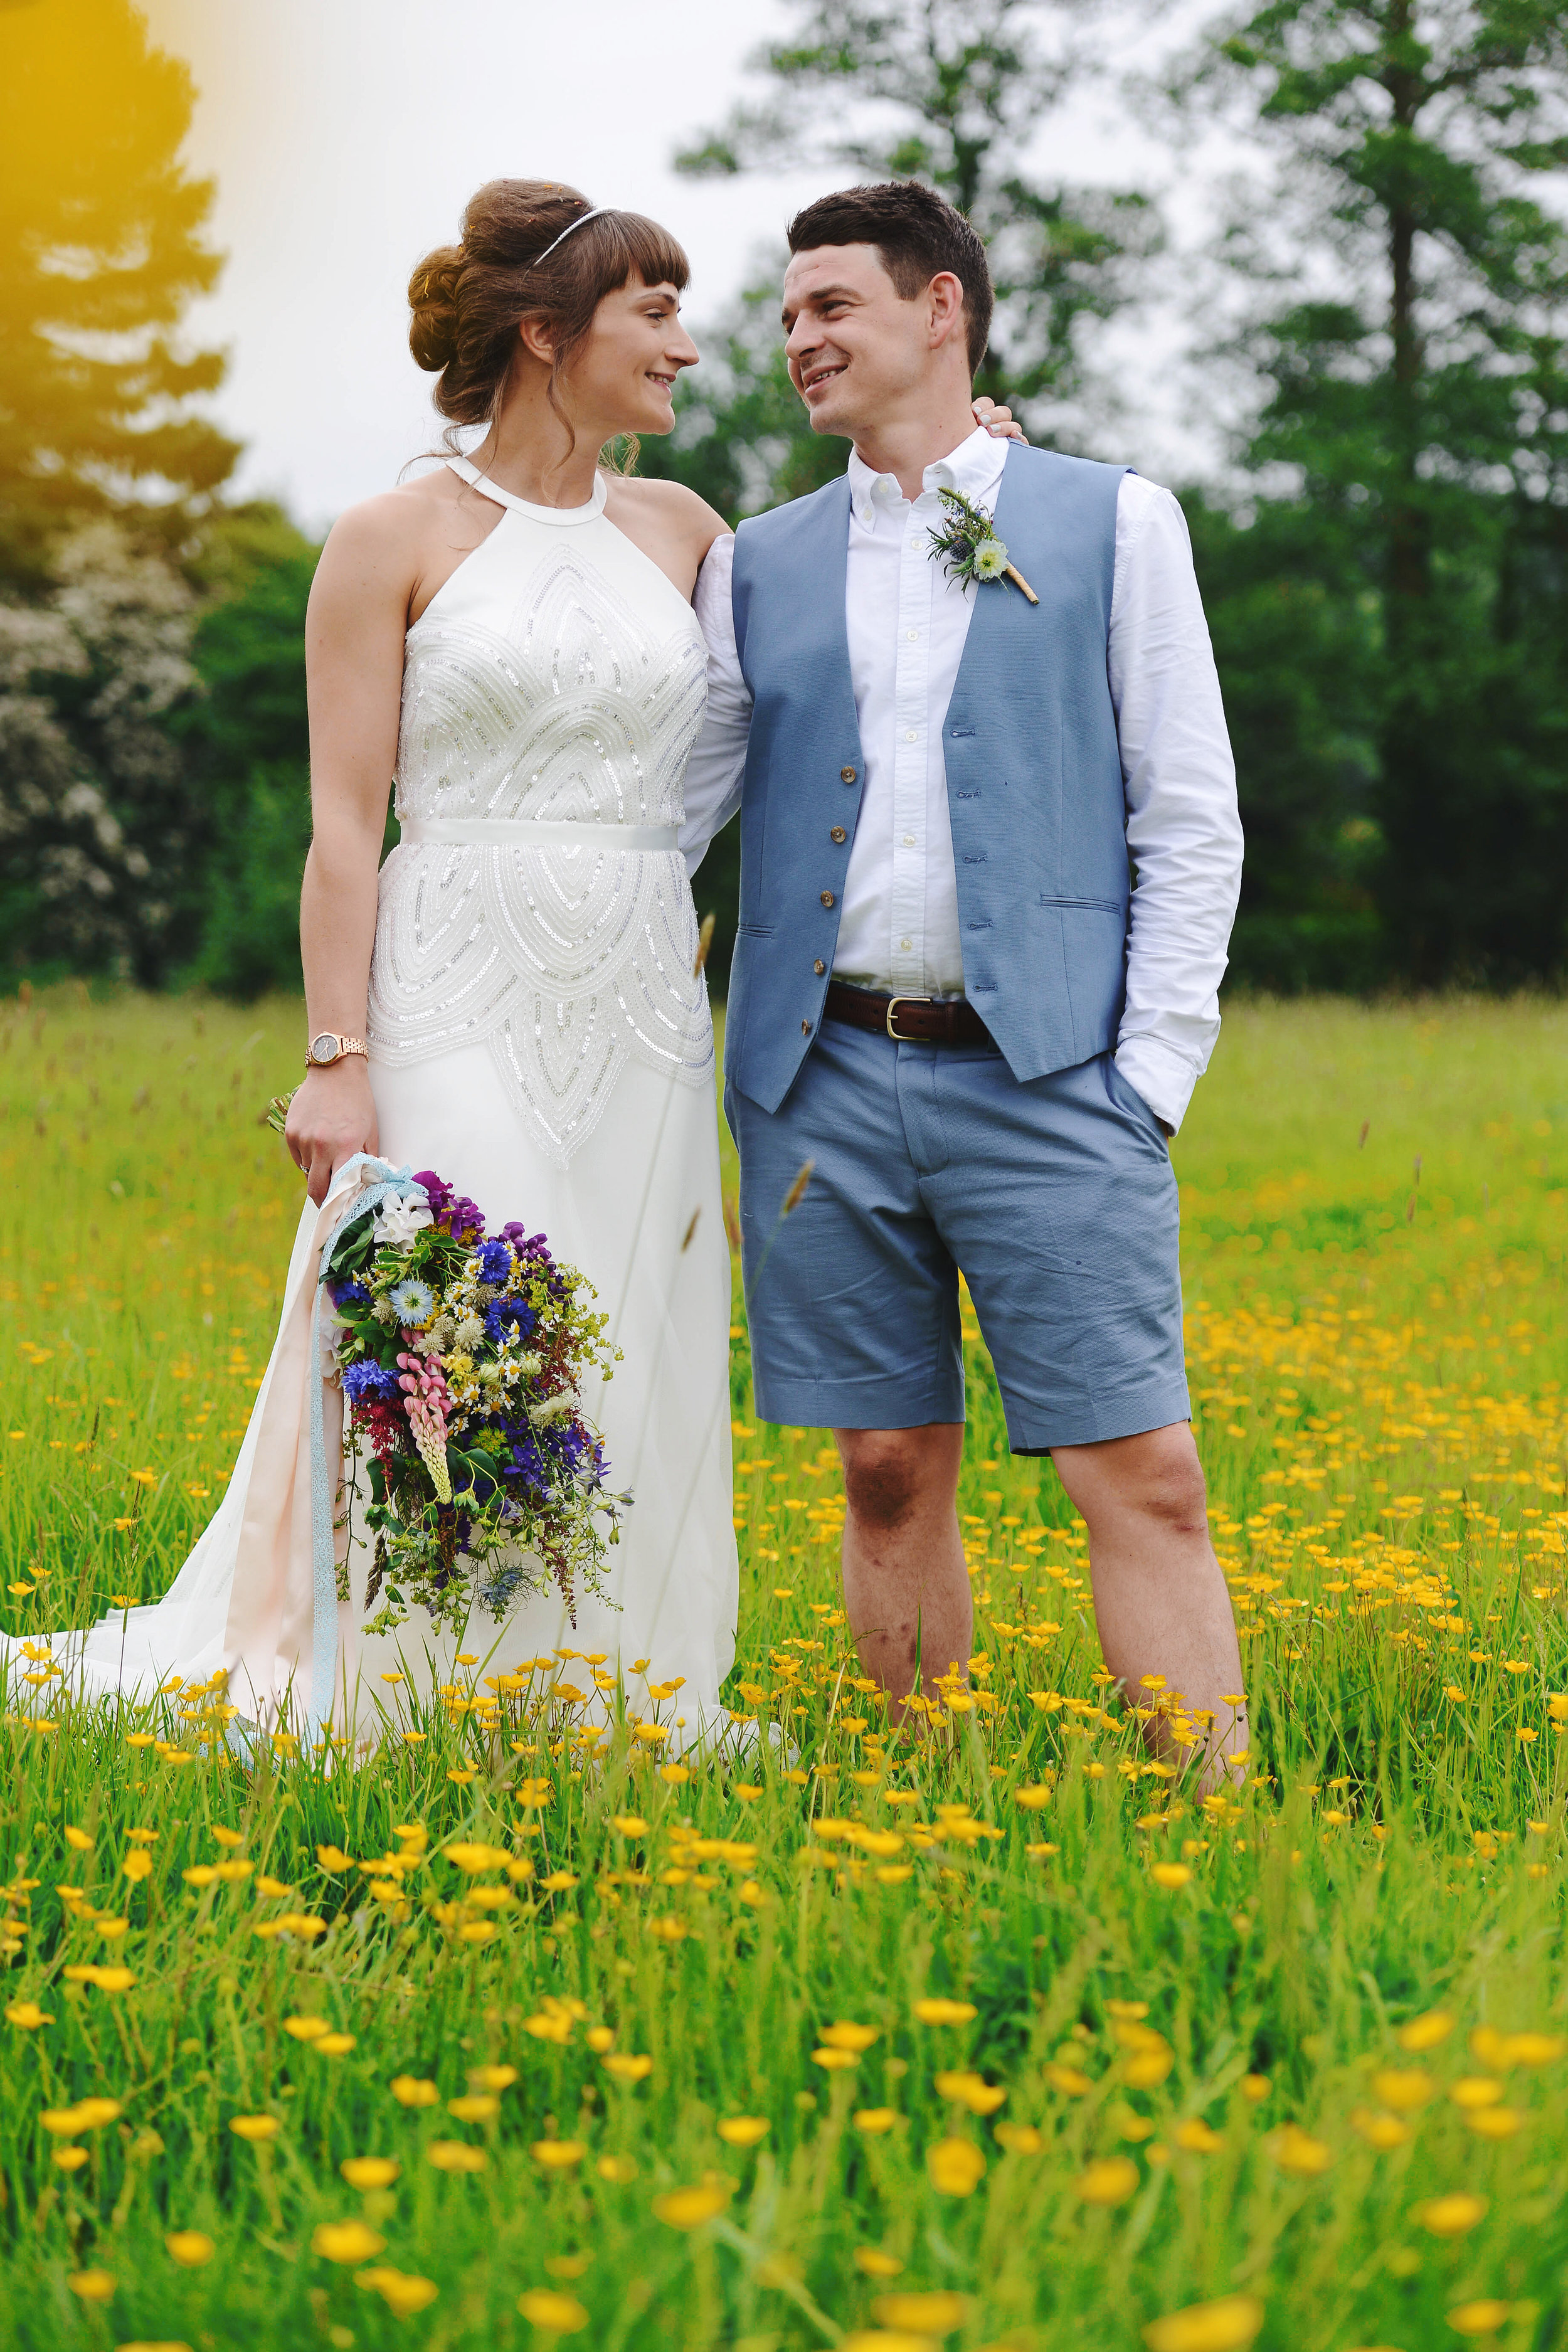 Mr and Mrs002.jpg